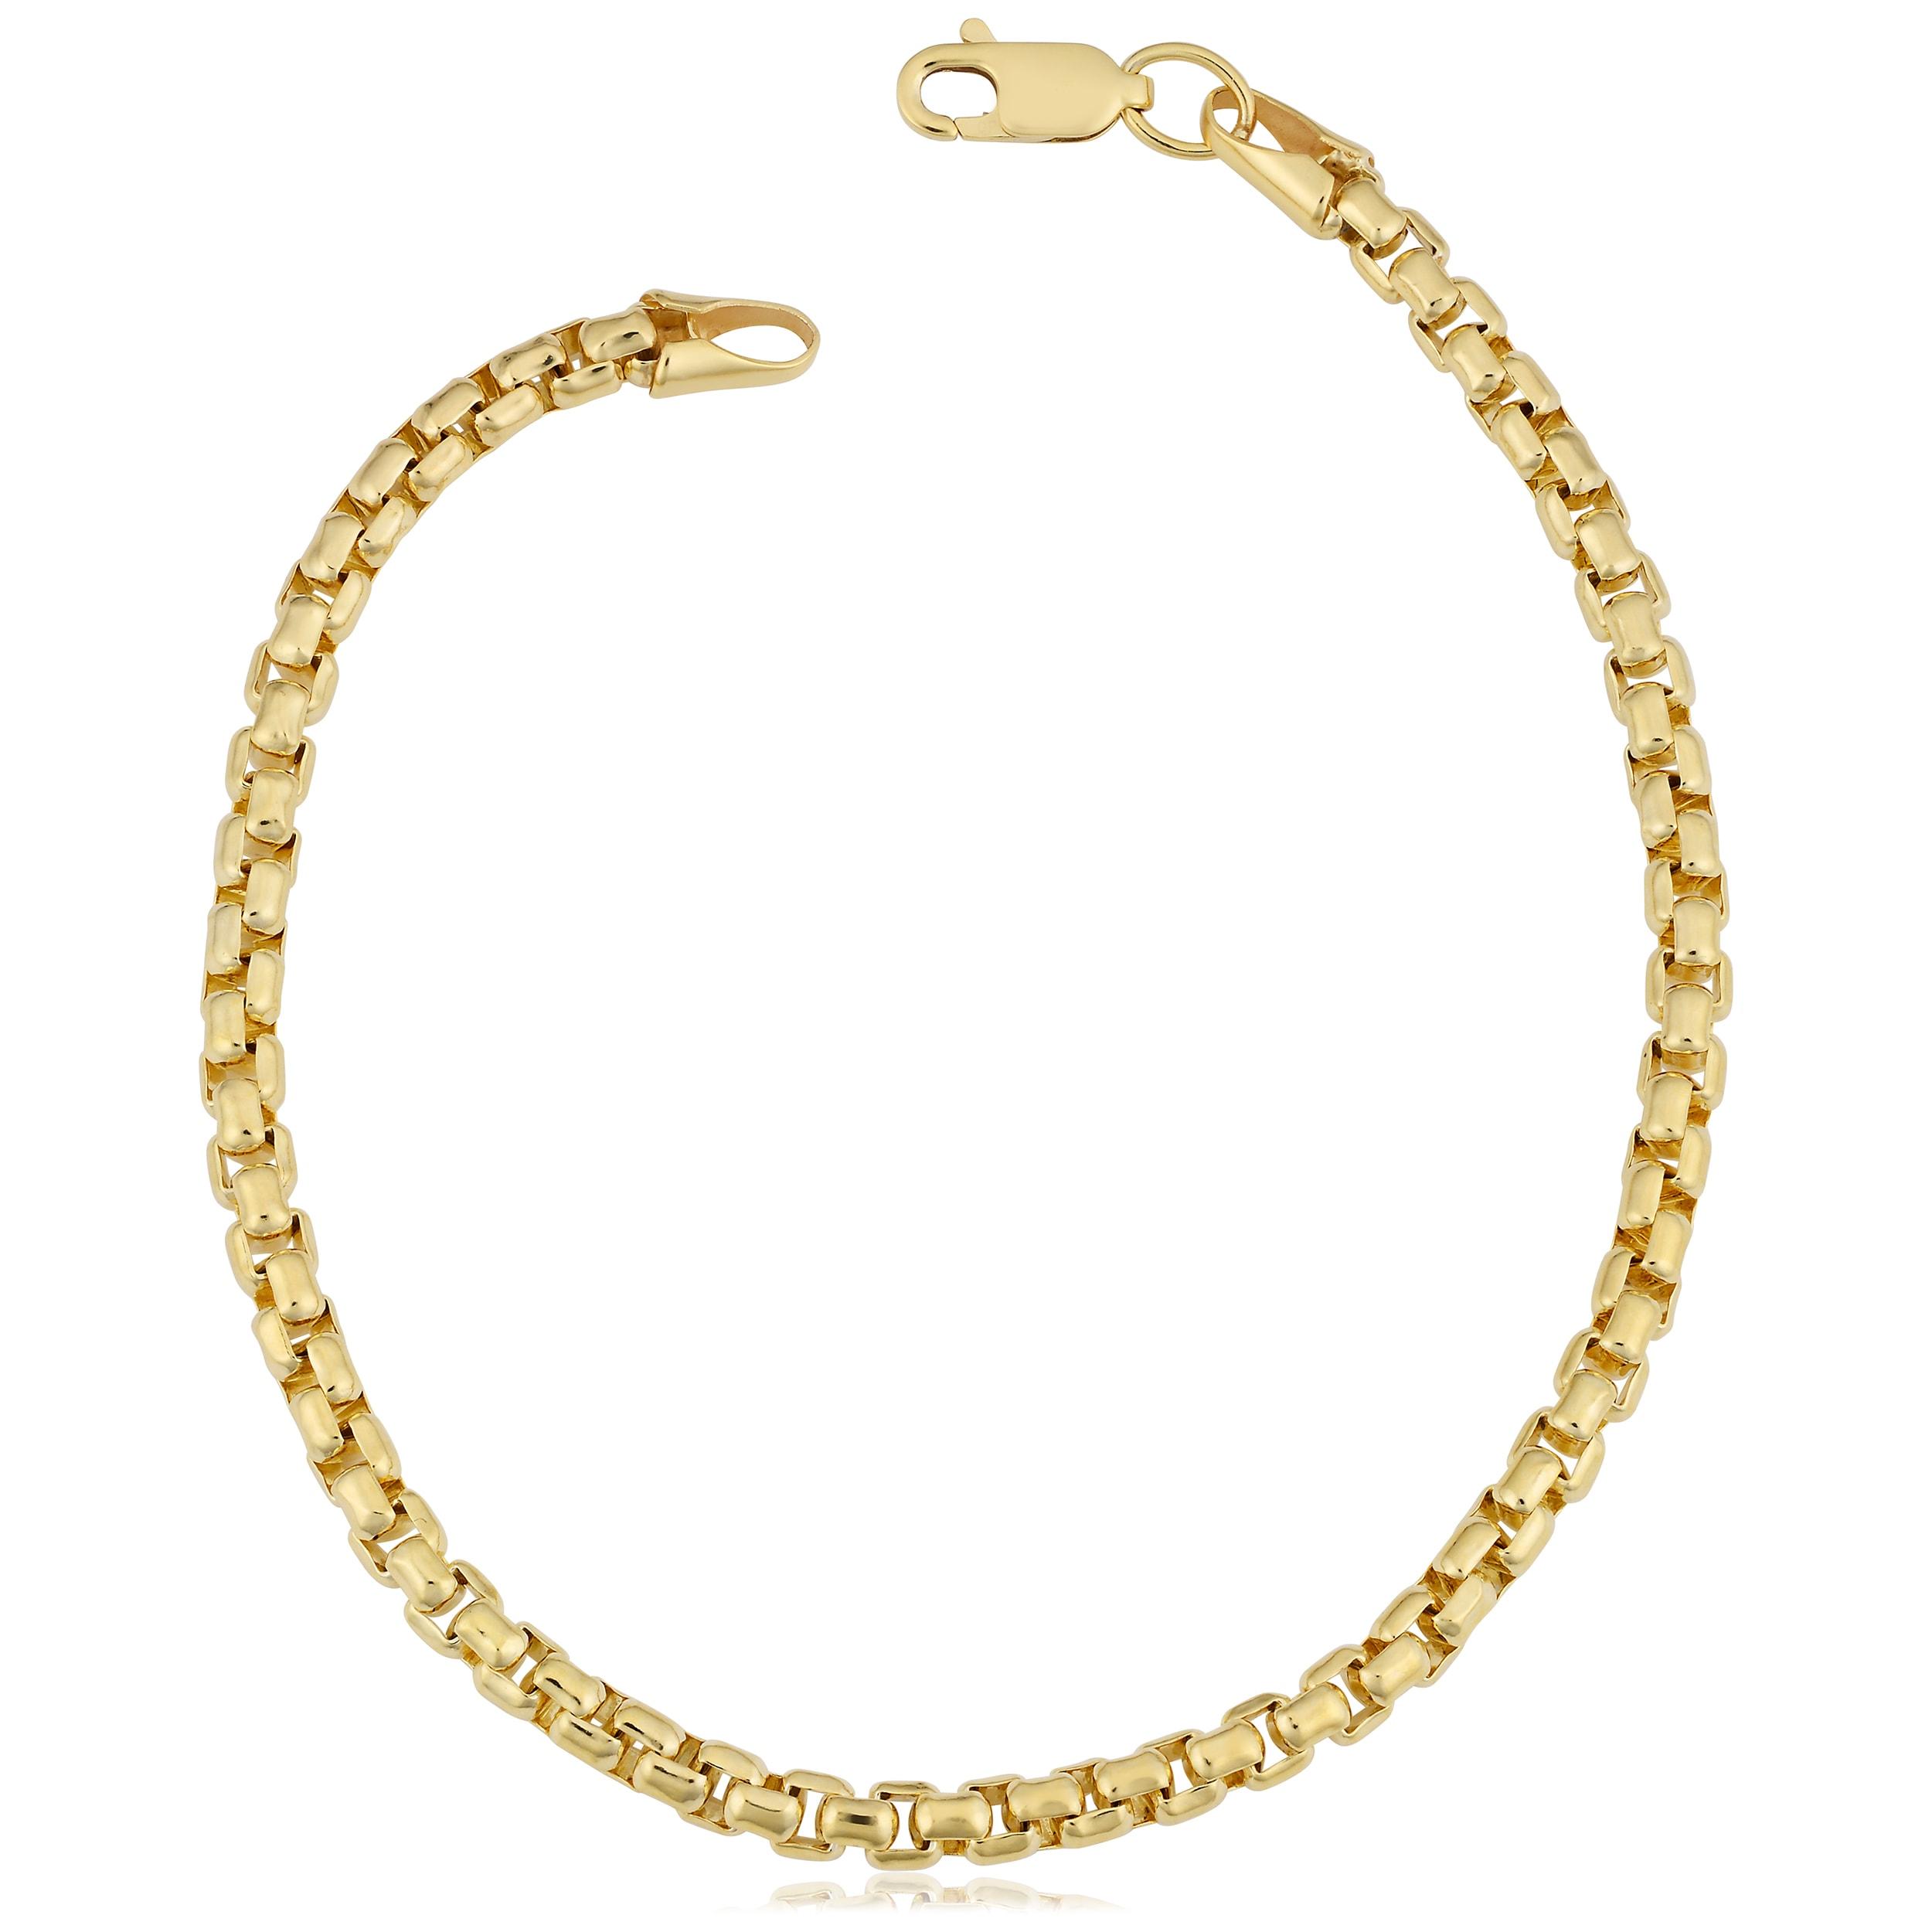 14k Yellow Gold Double Circle Womens Bracelet 7.5